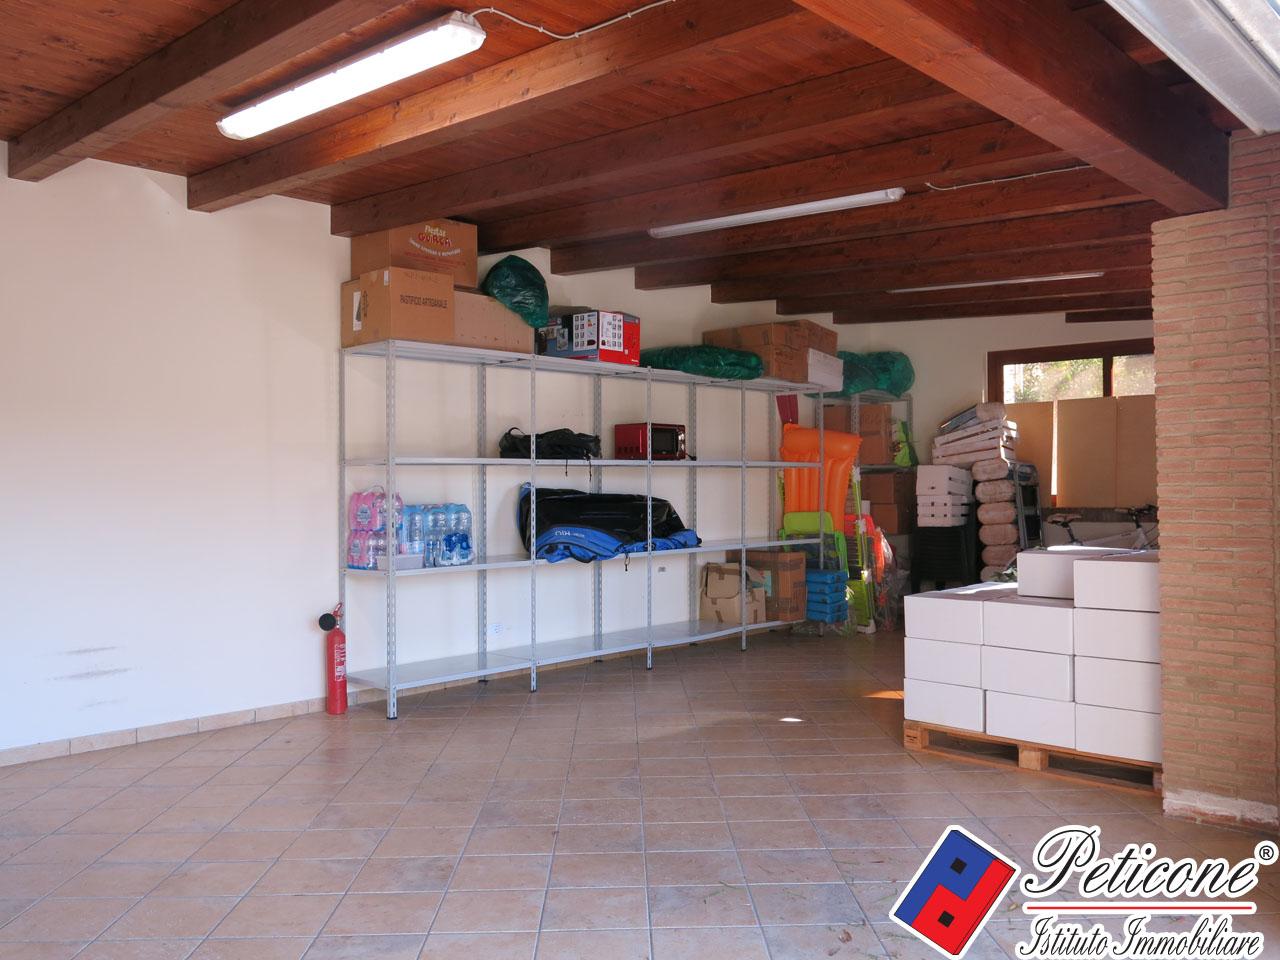 Villa in Vendita a Fondi: 3 locali, 107 mq - Foto 17